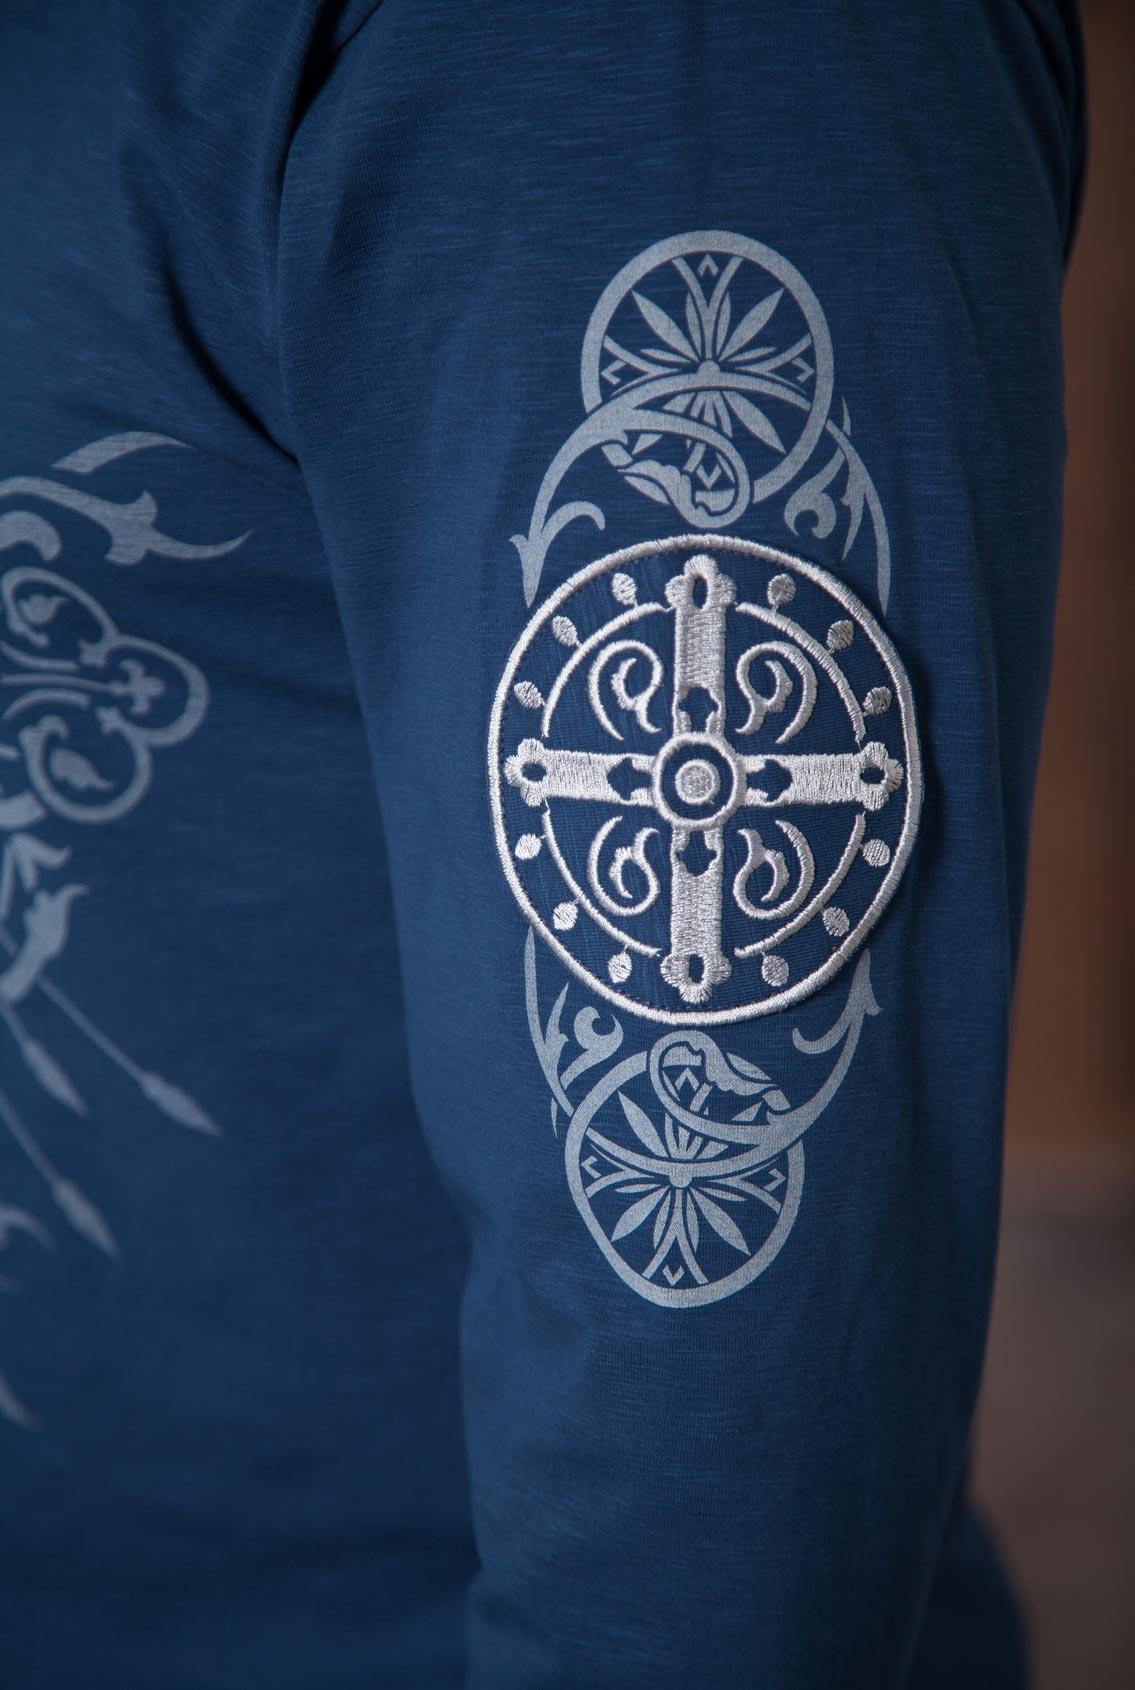 футболка с вышивкой мужская, T-shirt with embroidery for men